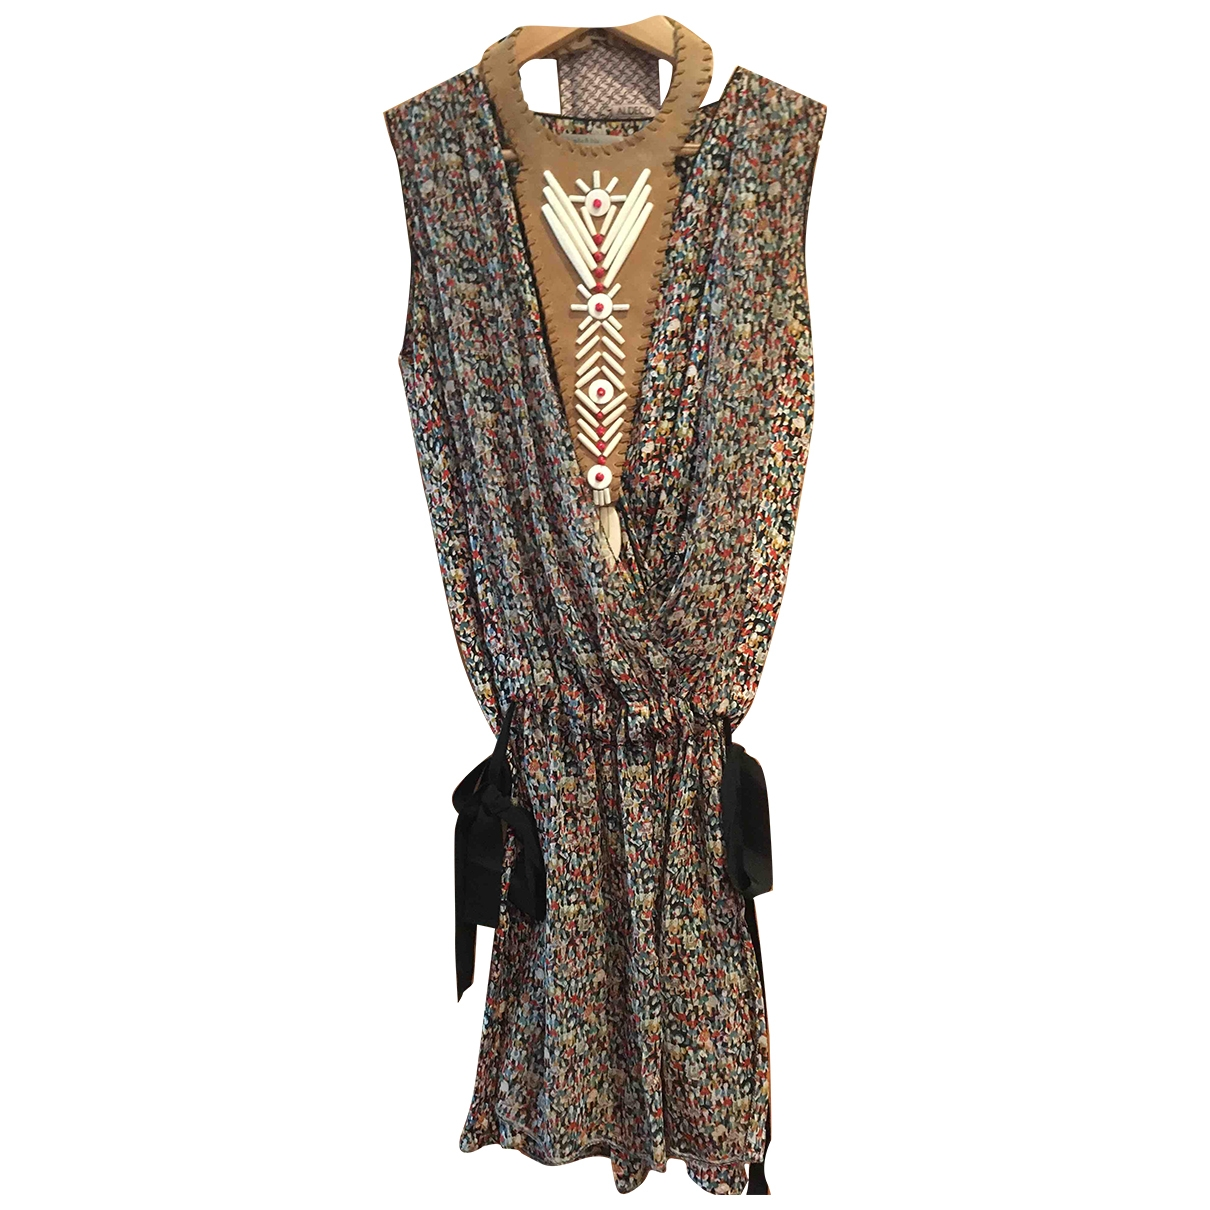 Bimba Y Lola \N Silk dress for Women XS International